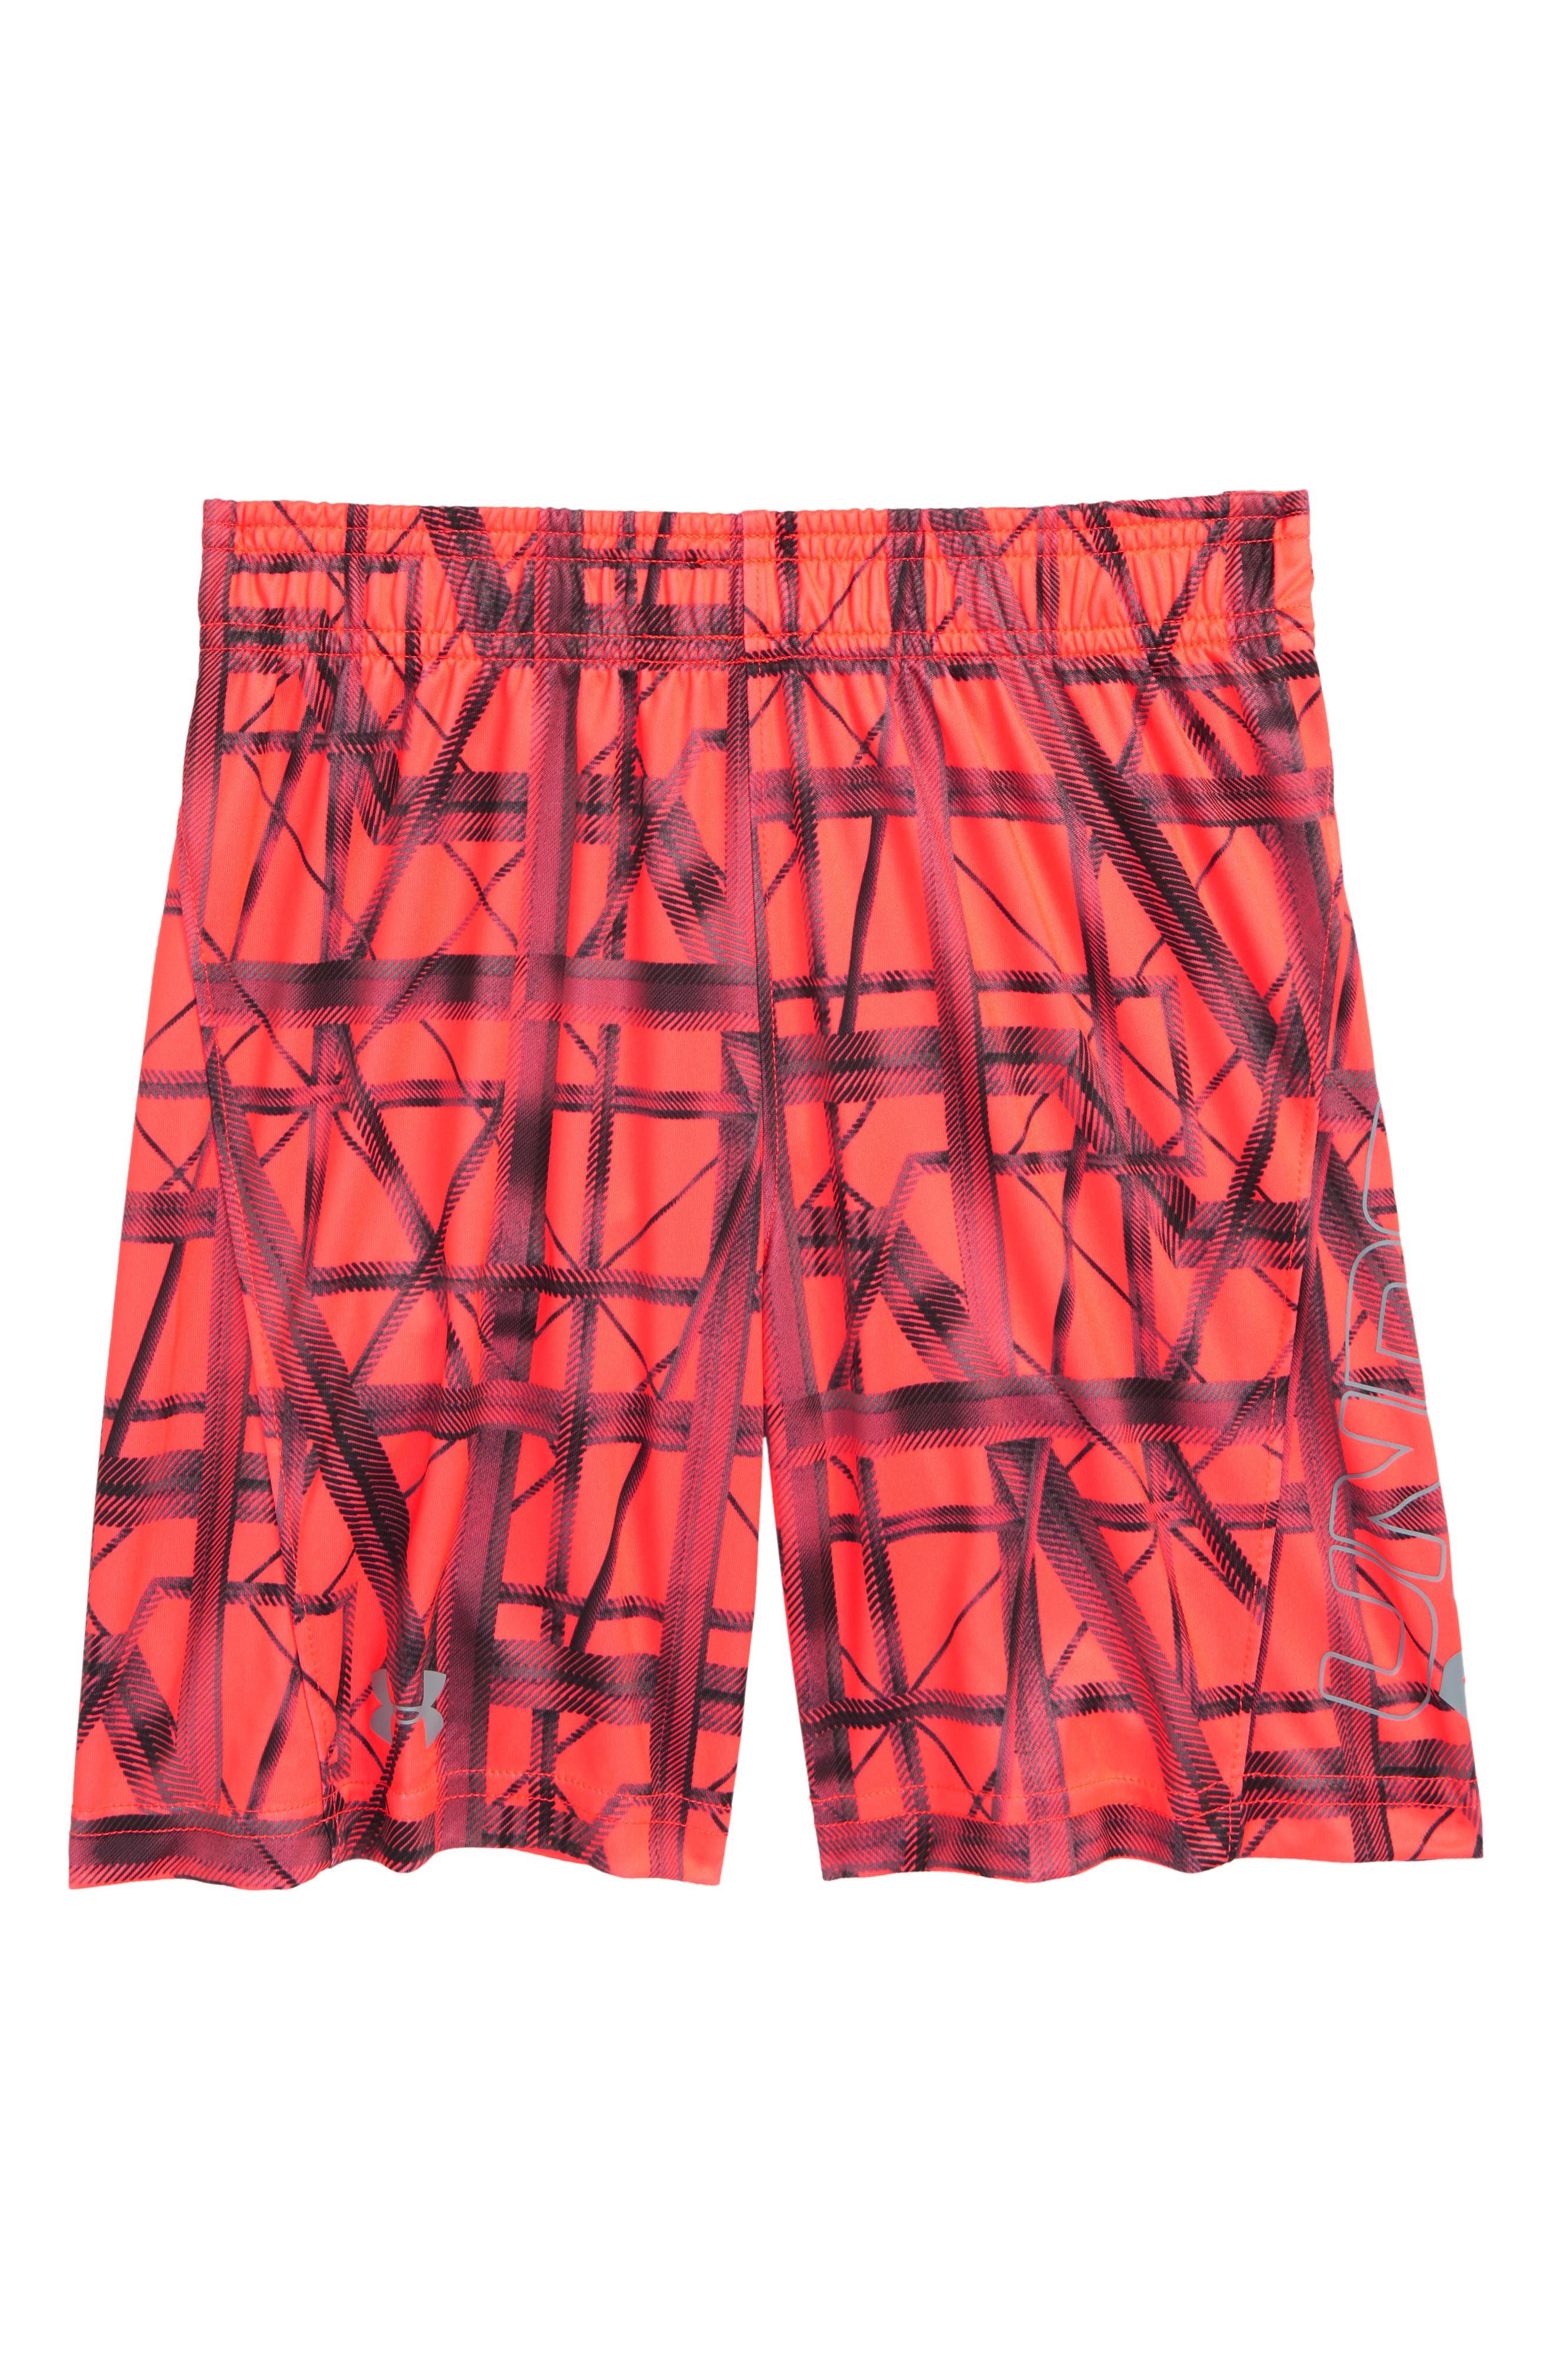 Distinction Boost HeatGear<sup>®</sup> Shorts,                         Main,                         color, 820